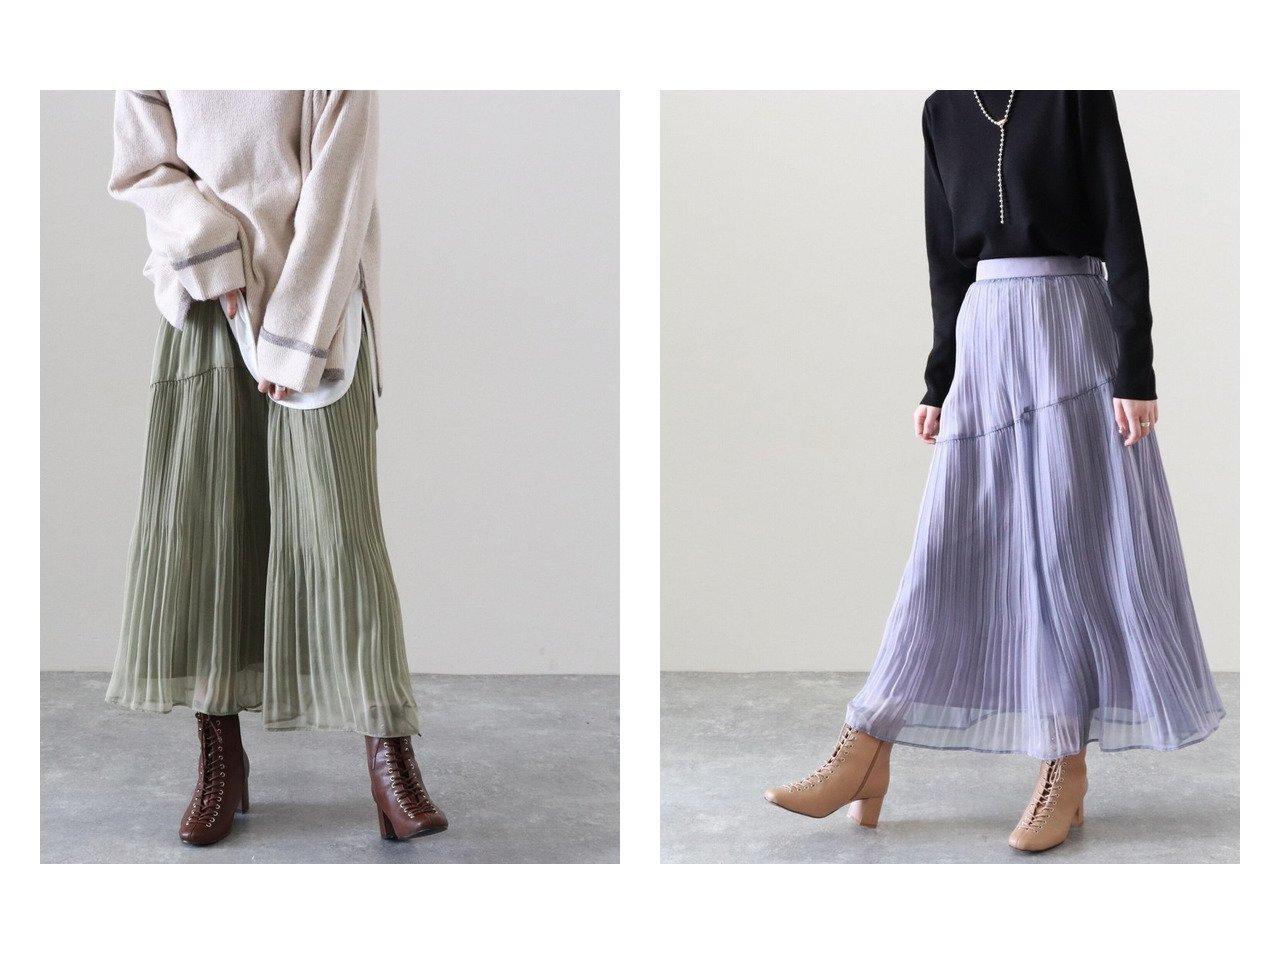 【Cheek/チーク】のシャイニーシフォンプリーツスカート 【スカート】おすすめ!人気、トレンド・レディースファッションの通販 おすすめで人気の流行・トレンド、ファッションの通販商品 メンズファッション・キッズファッション・インテリア・家具・レディースファッション・服の通販 founy(ファニー) https://founy.com/ ファッション Fashion レディースファッション WOMEN スカート Skirt プリーツスカート Pleated Skirts ロングスカート Long Skirt シャイニー スウェット パーカー プリーツ ミックス リブニット ロング 人気 定番 Standard |ID:crp329100000029608